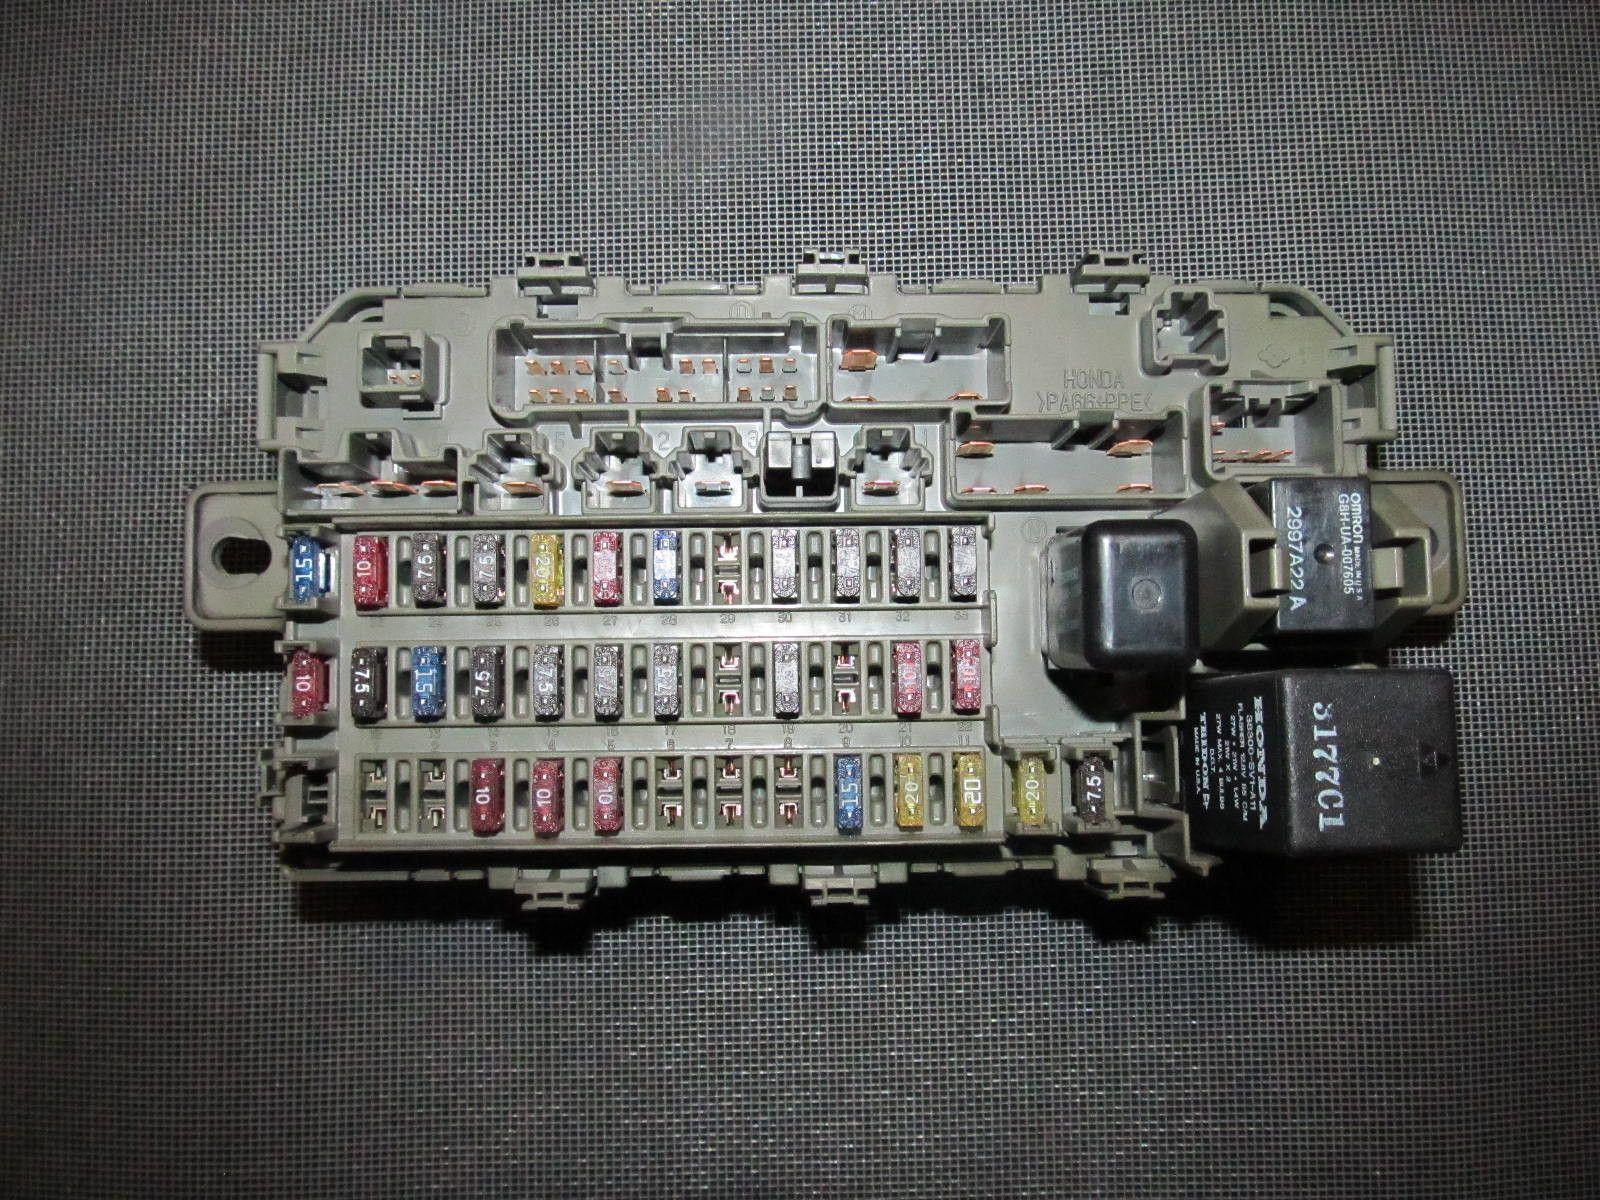 96 97 98 99 00 honda civic oem interior fuse box with relay 2000 honda civic [ 1600 x 1200 Pixel ]